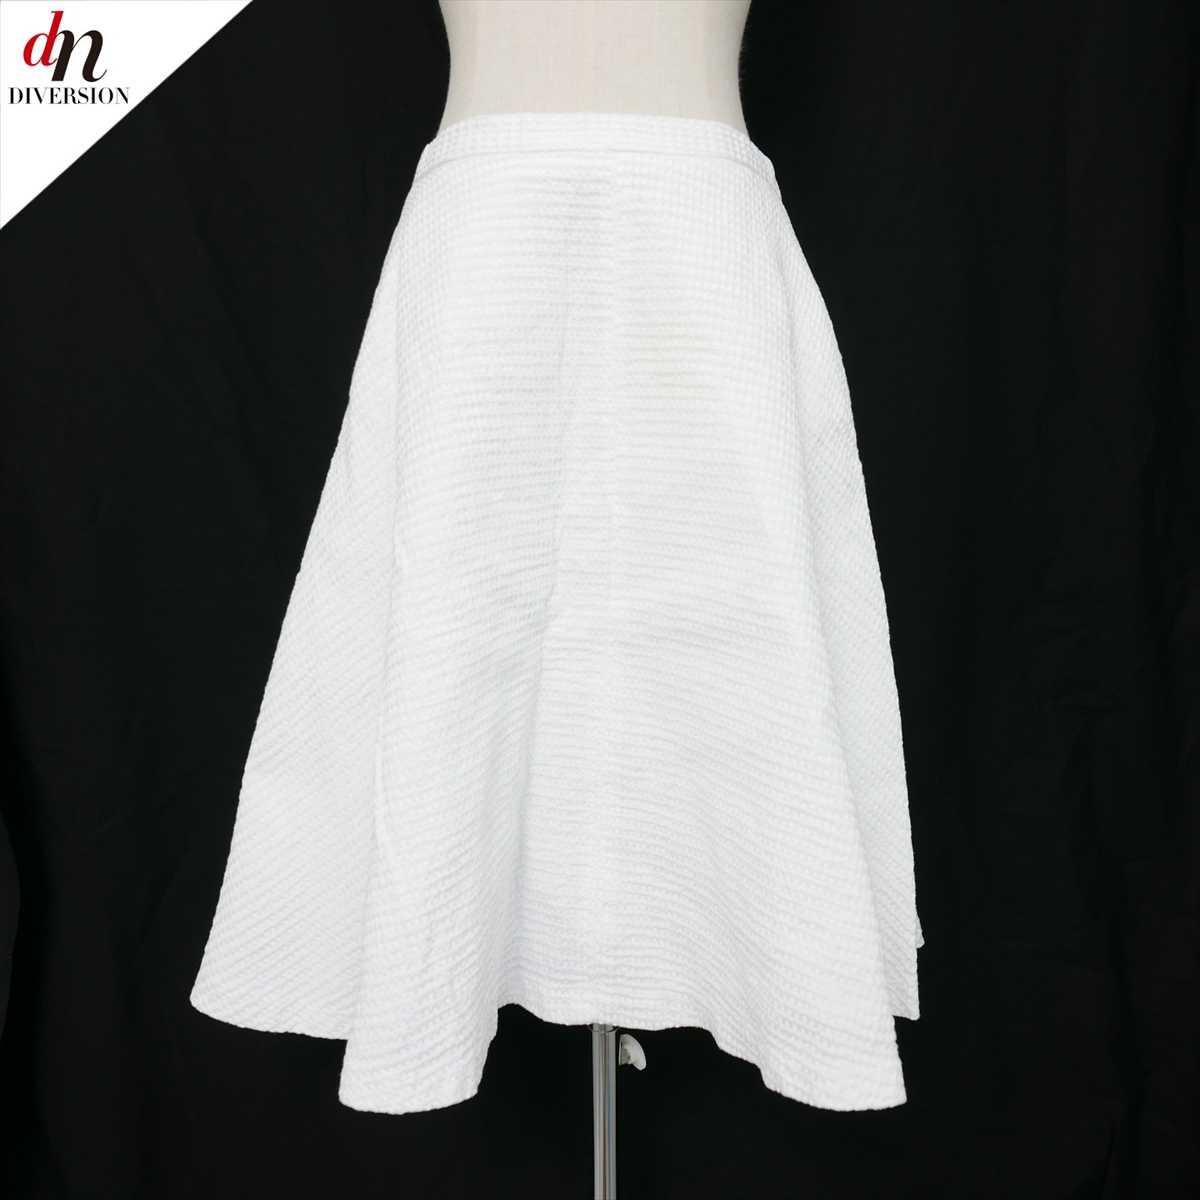 ZARA BASIC ザラ 膝丈 無地 ワッフル フレアスカート WHITE USA M 【中古】 DN-8919